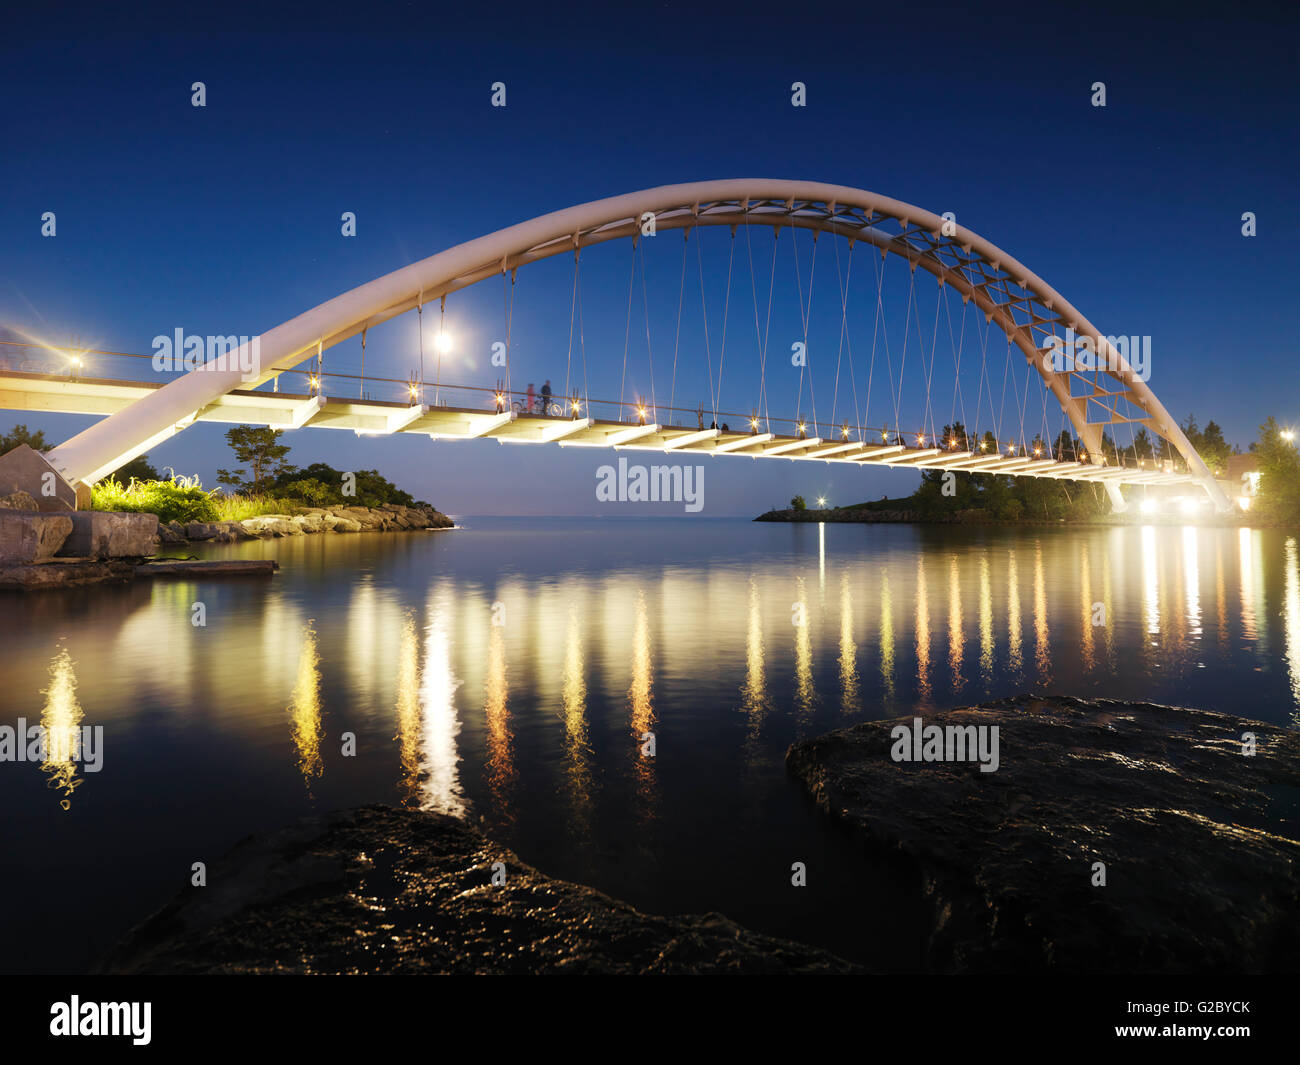 Humber River Arch Bridge bei Nacht, Toronto, Provinz Ontario, Kanada Stockbild